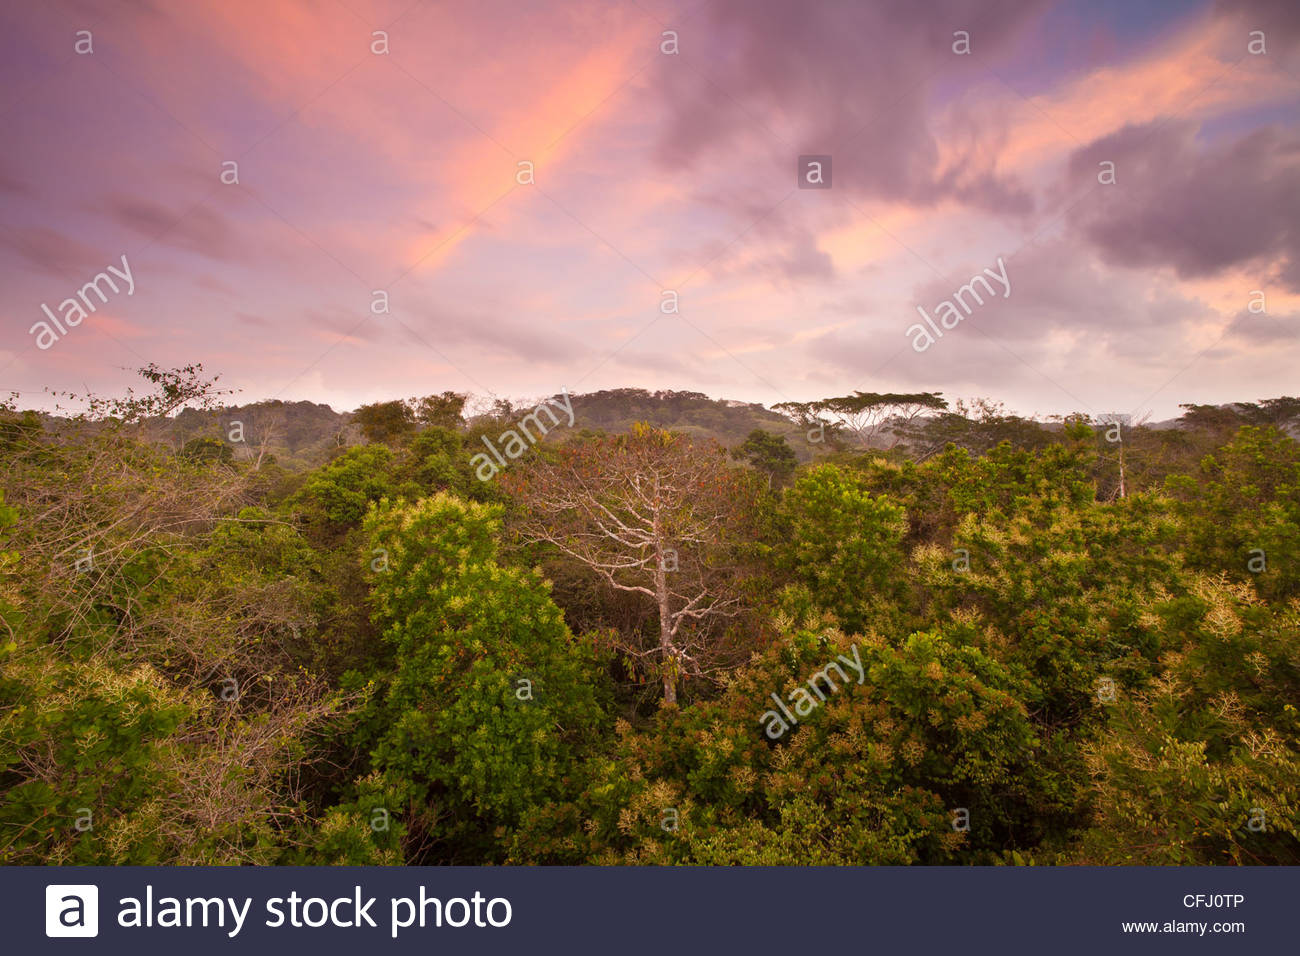 Am frühen Morgen im Regenwald von Soberania Nationalpark, Republik Panama. Stockfoto